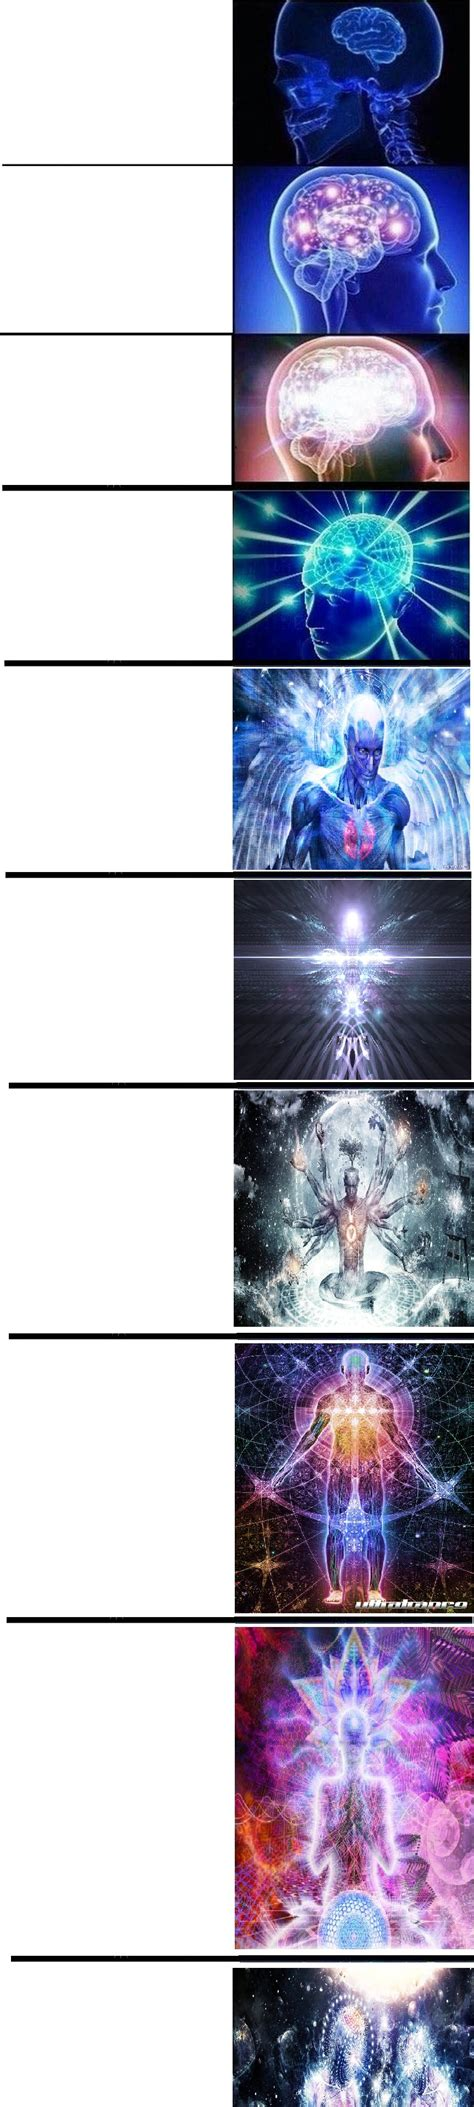 Expanded Brain Meme Template Doliquid Imgflip Meme Templates